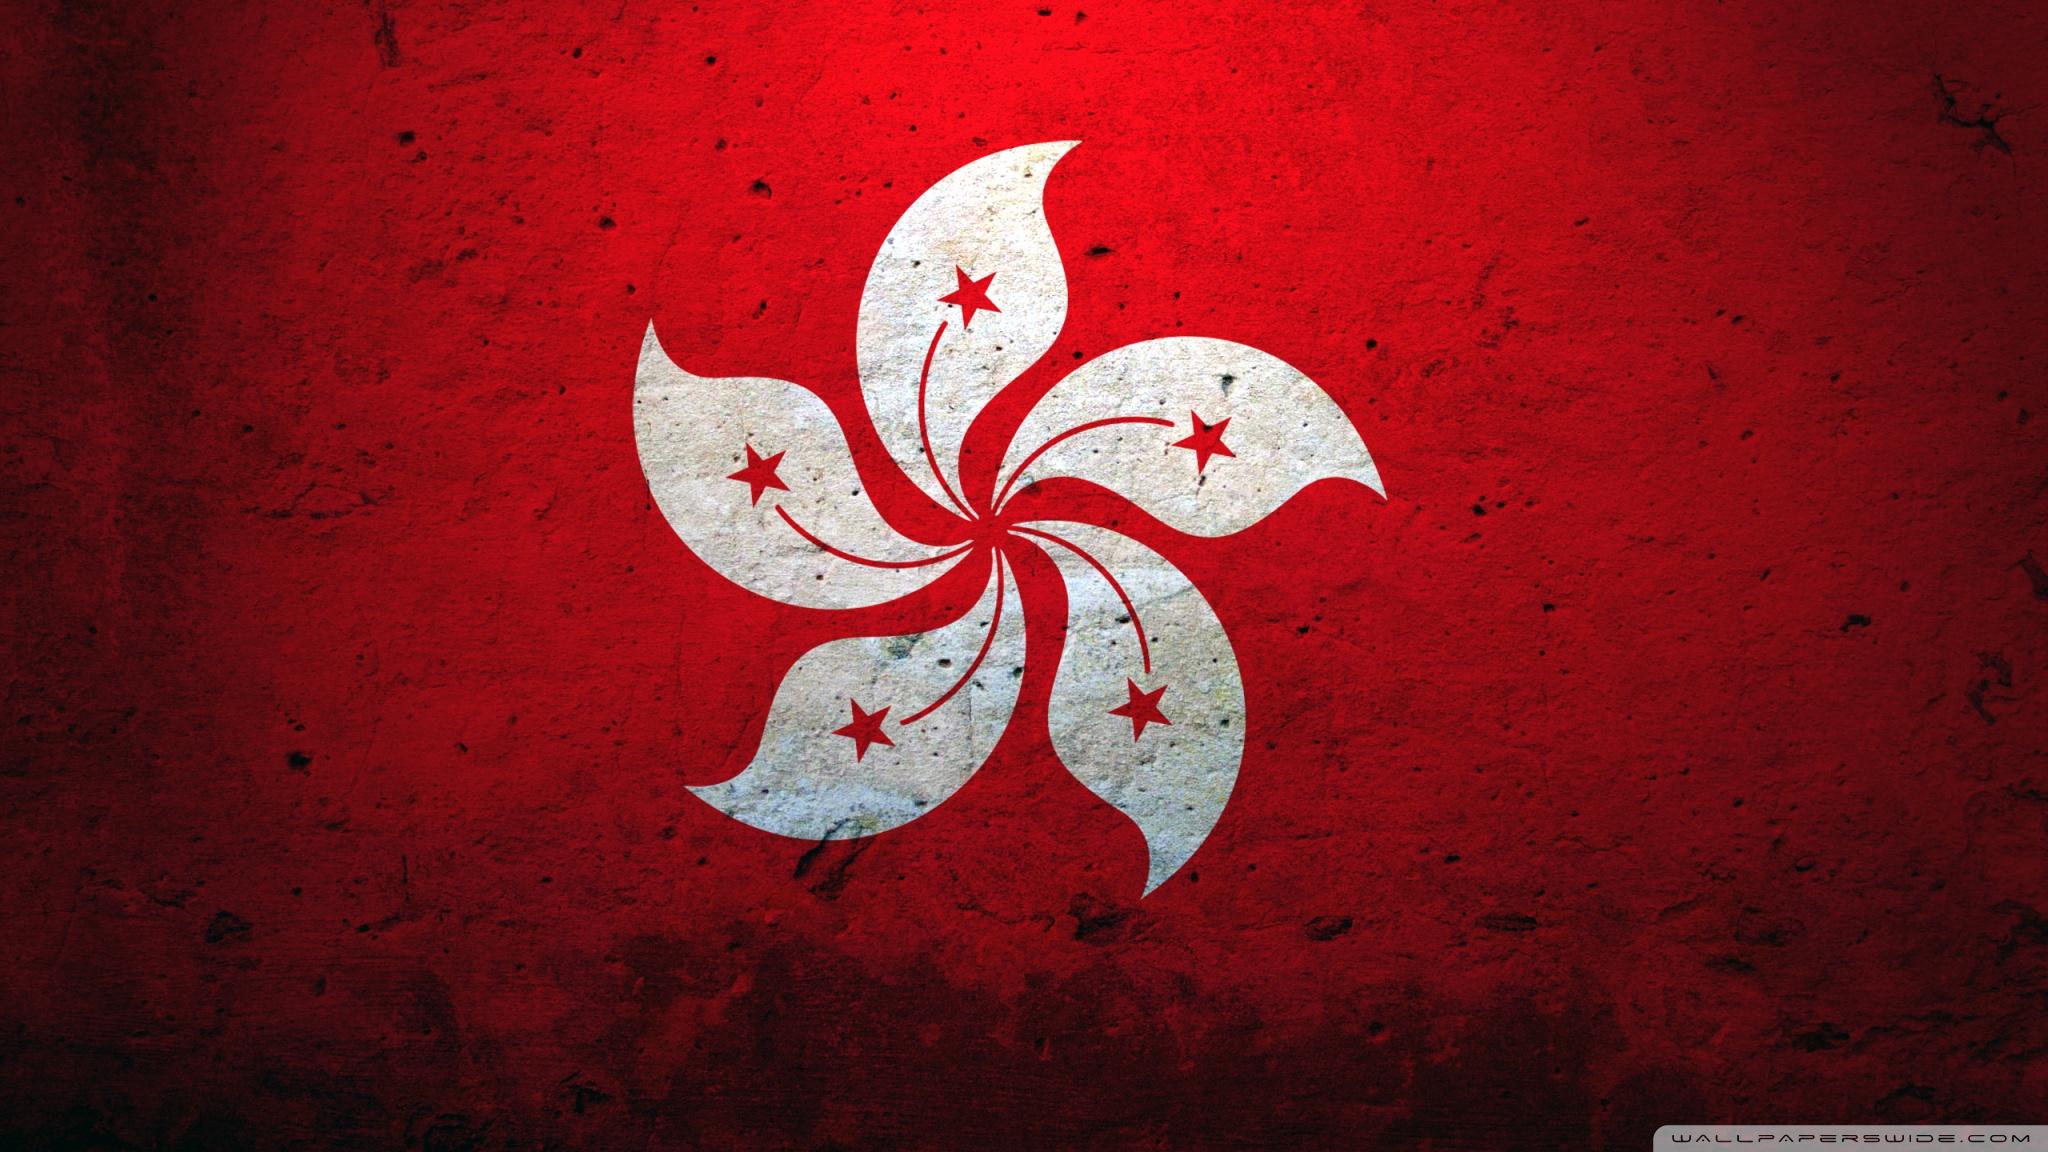 Hong Kong China Flag 4K HD Desktop Wallpaper for 4K Ultra HD TV 2048x1152